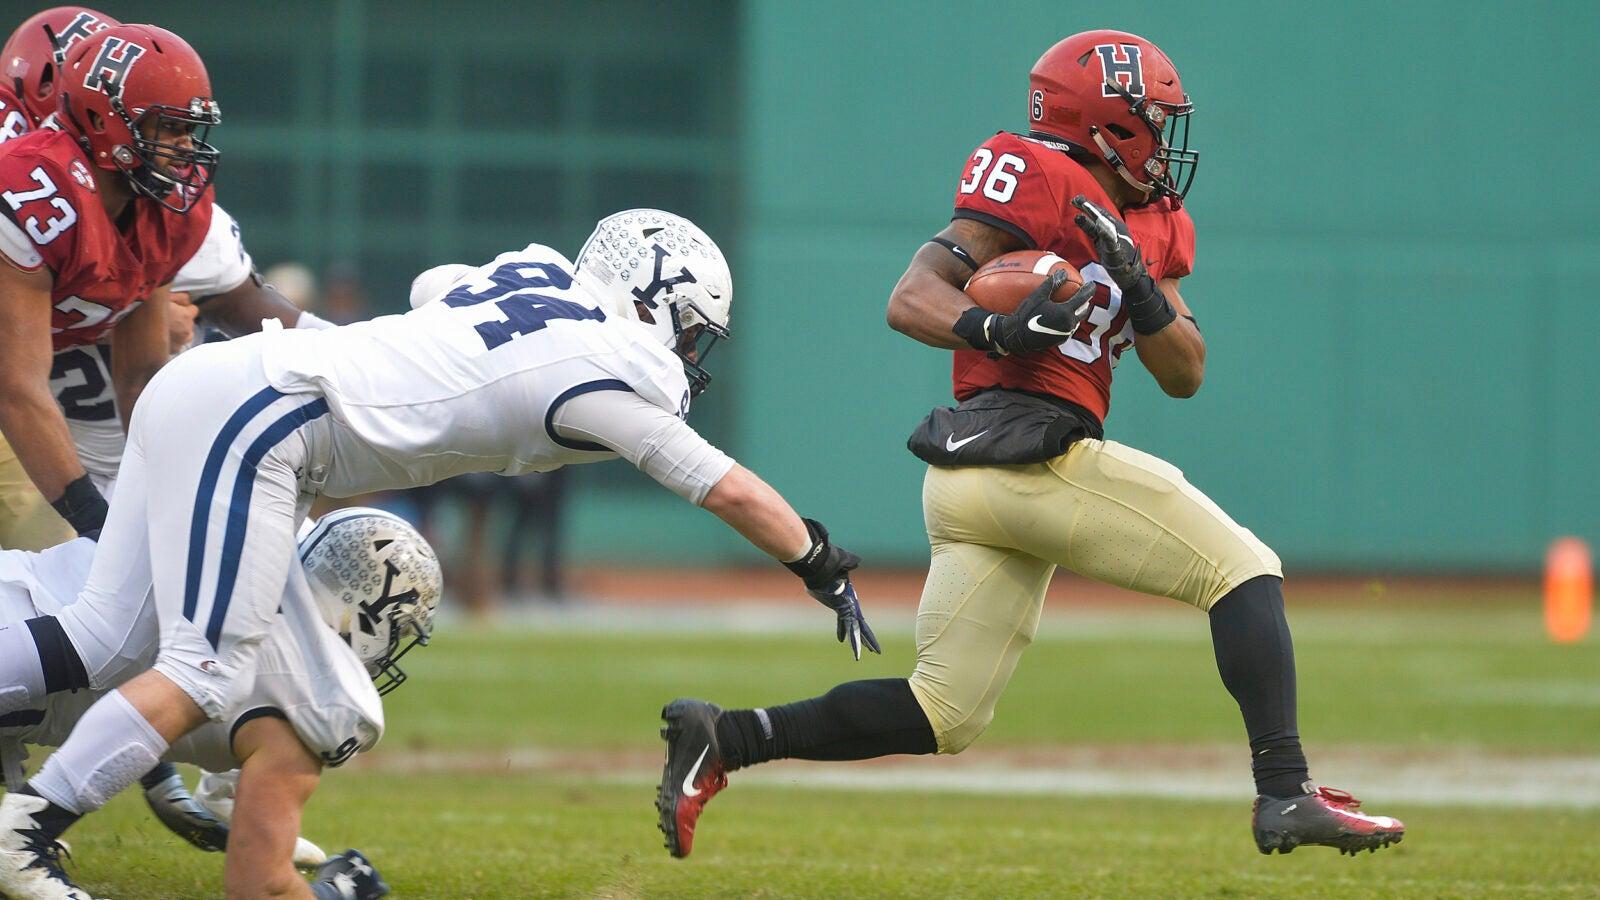 A Harvard football player running down the field